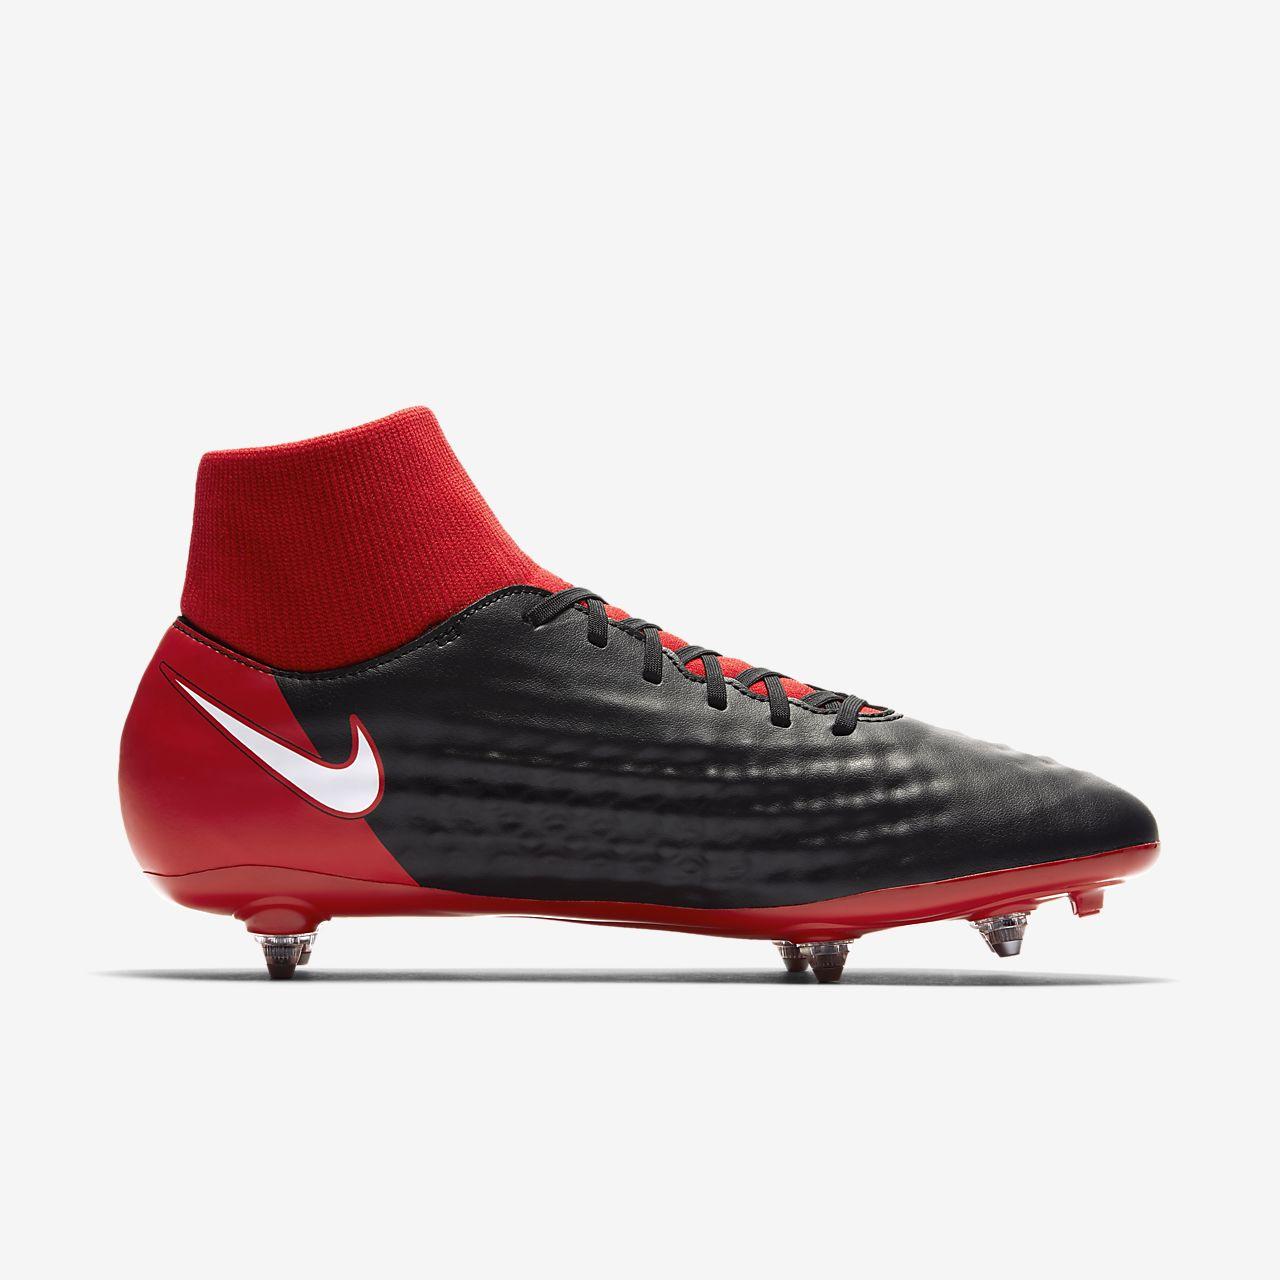 ... Nike Magista Onda II Dynamic Fit Soft-Ground Football Boot